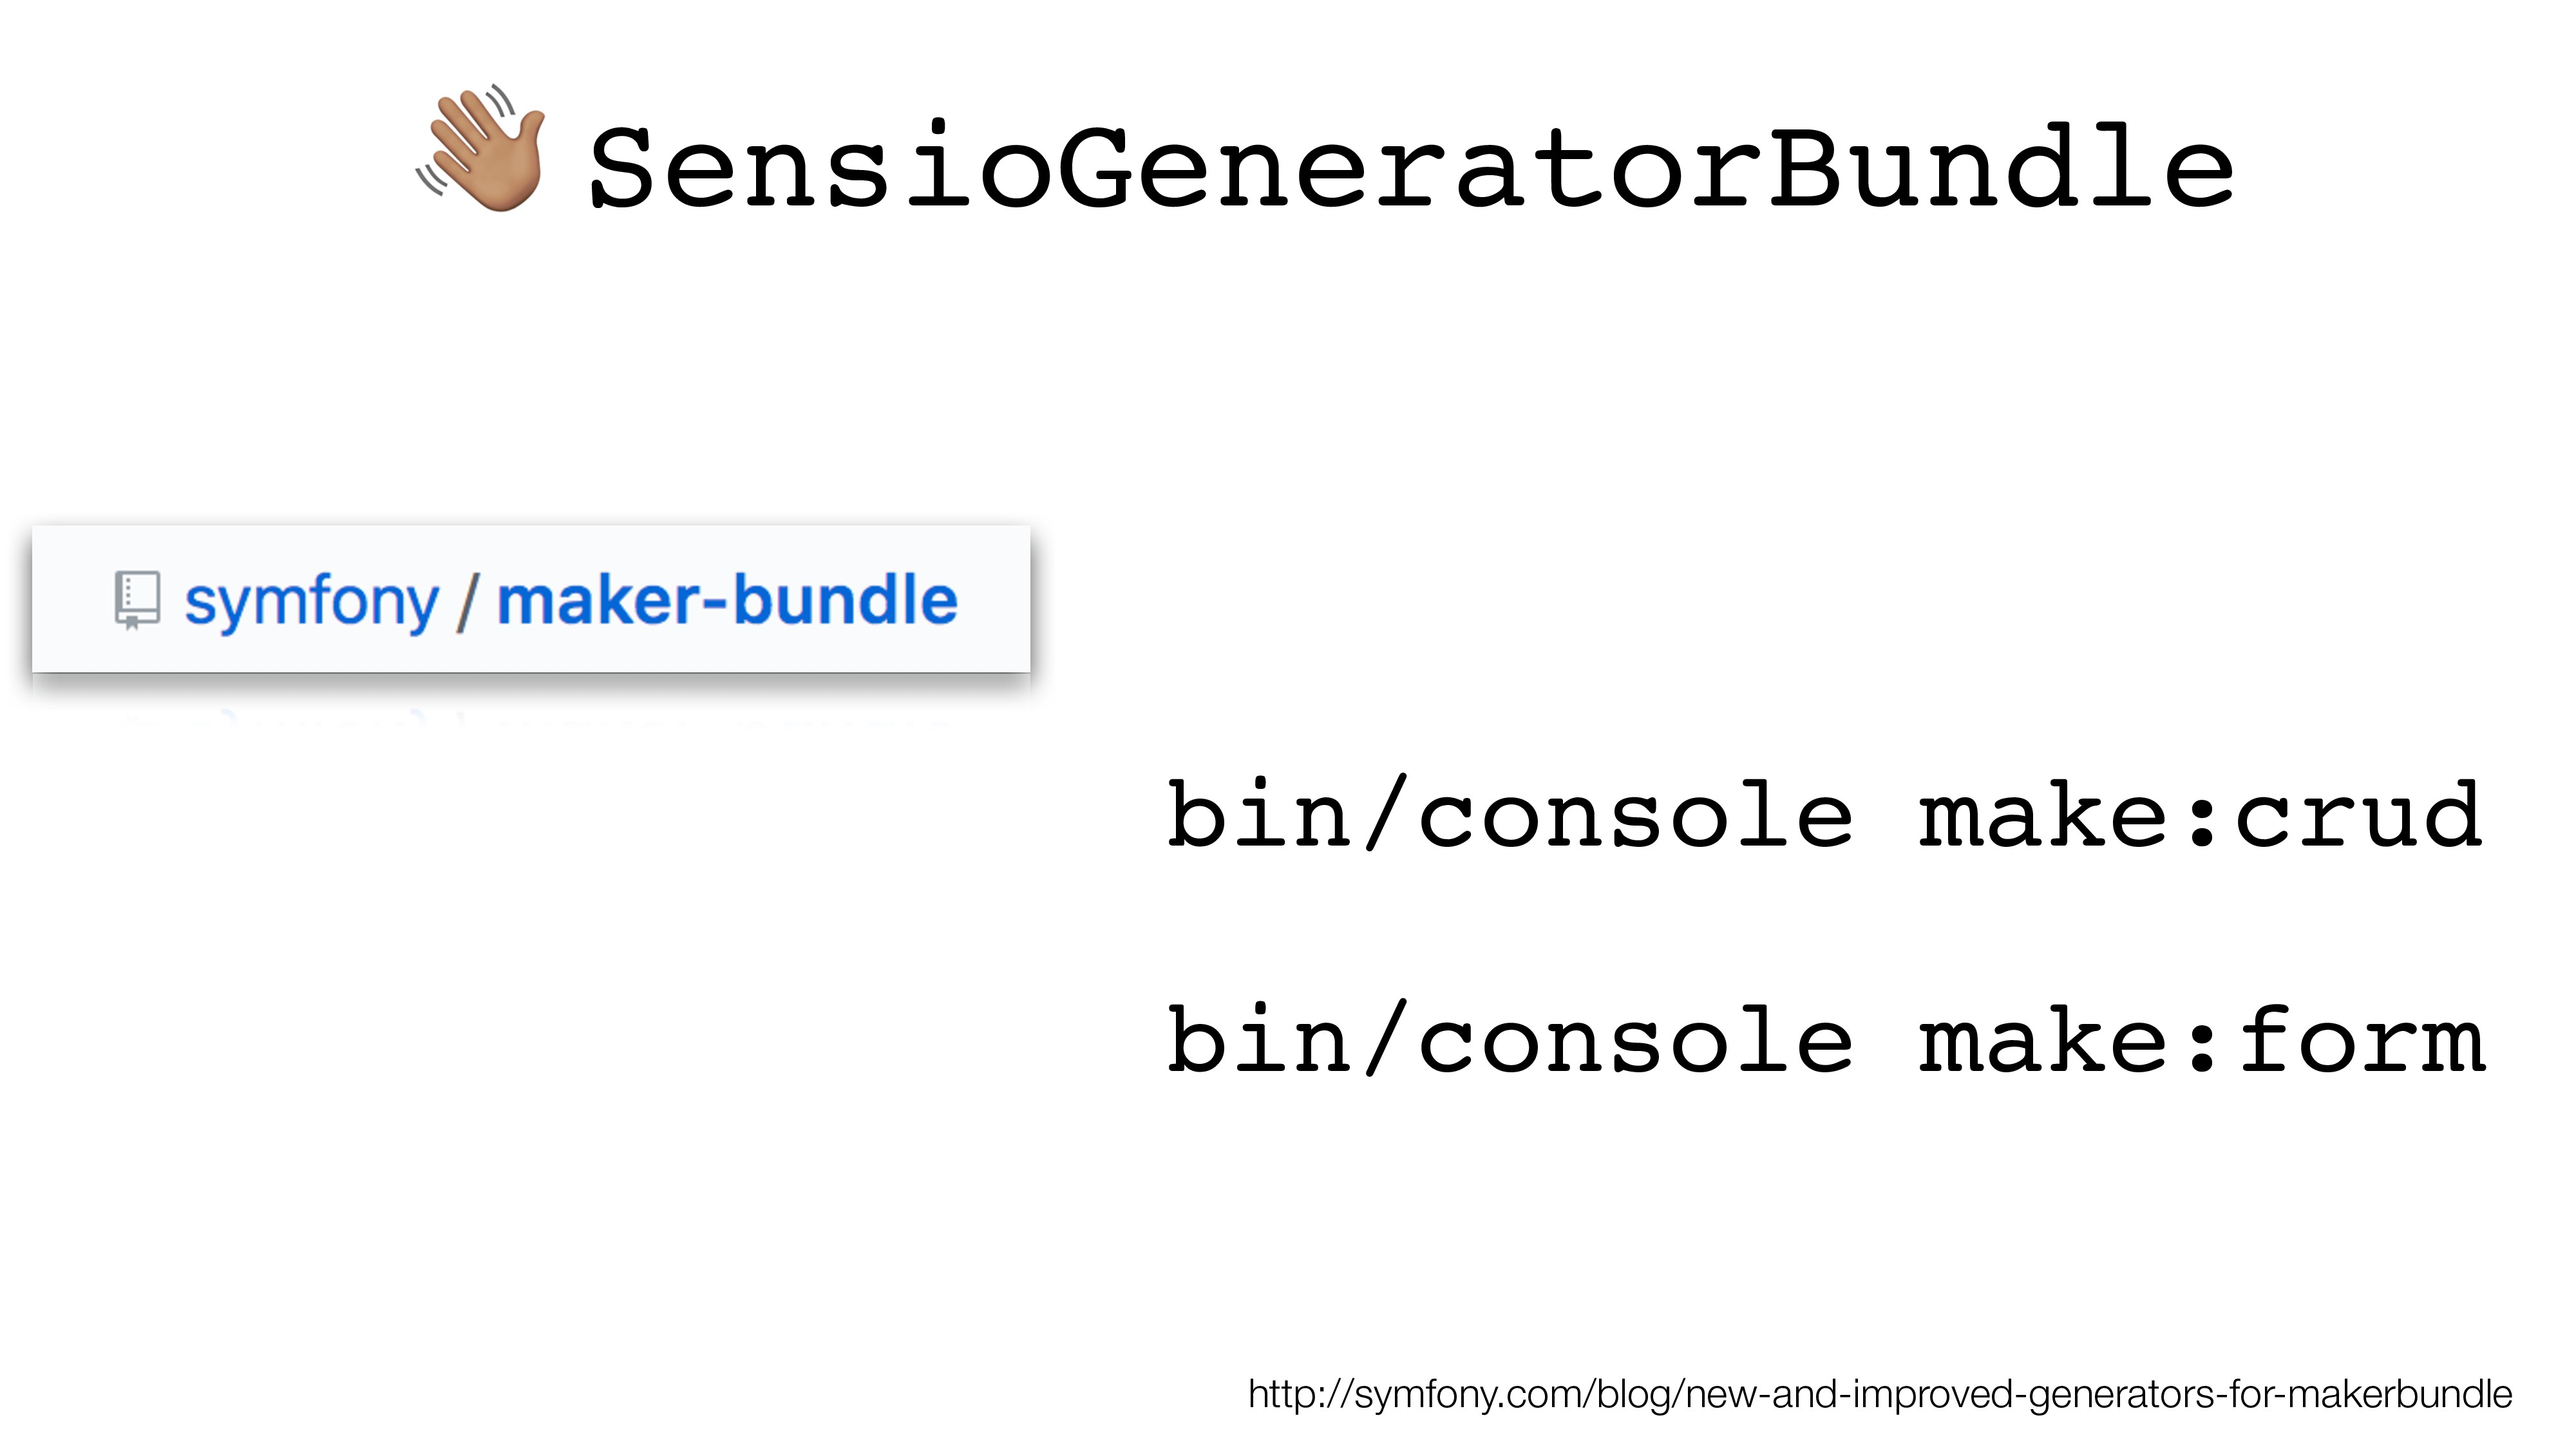 """ SensioGeneratorBundle http://symfony.com/blog..."